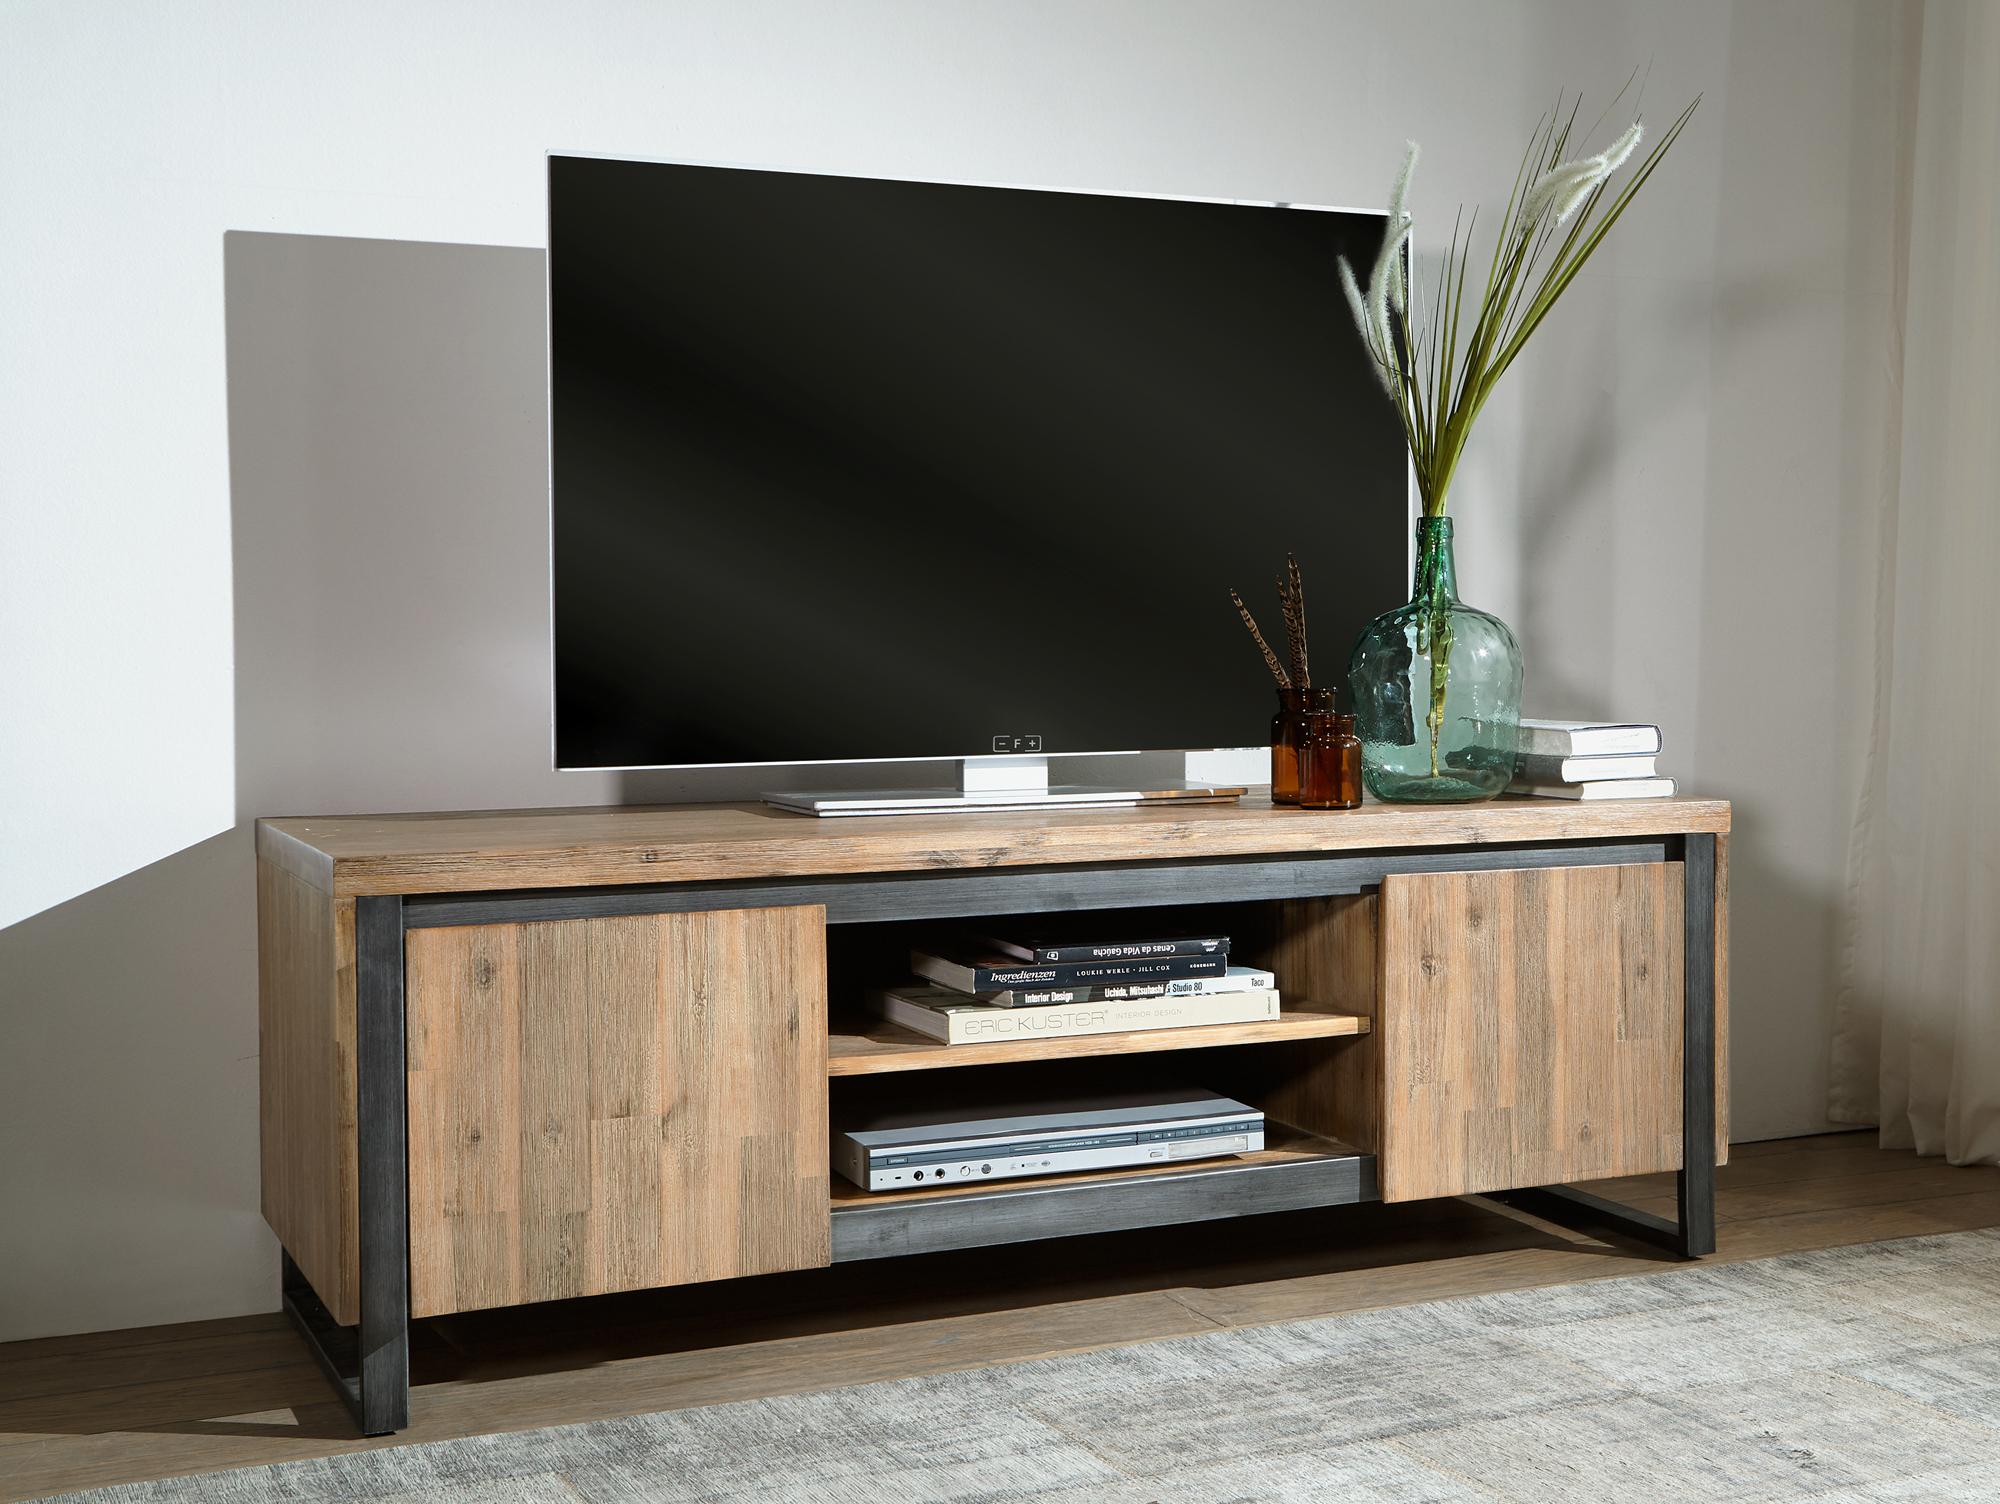 akazie geburstet malaga tv lowboard i material massivholz akazie geburstet